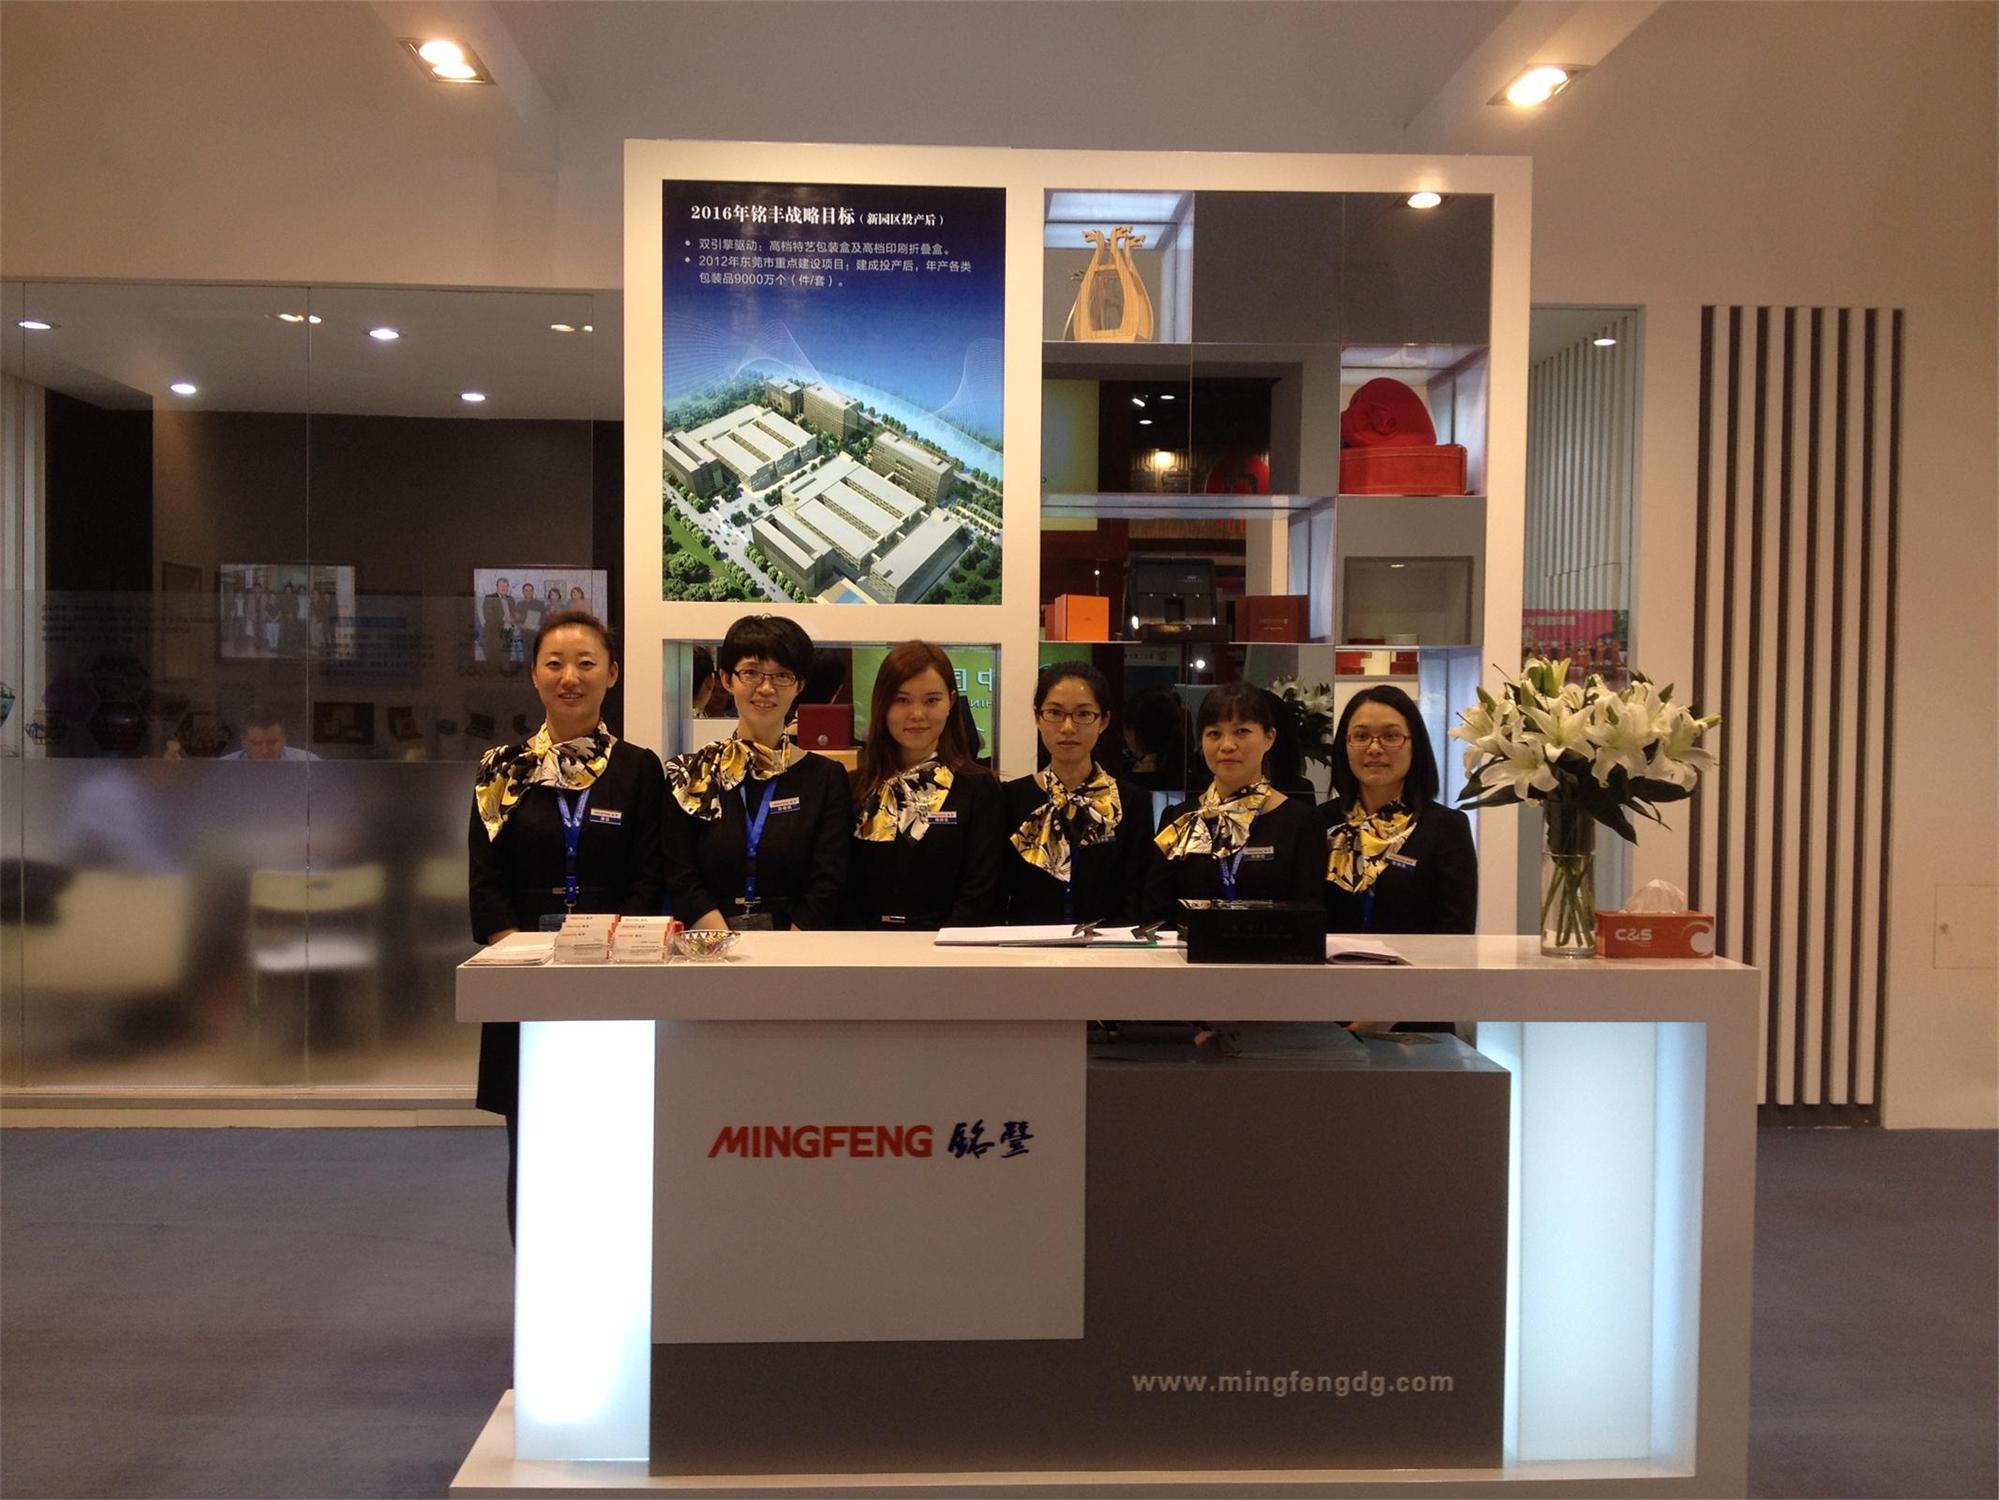 Beijing Numismatic Exhibition Expo